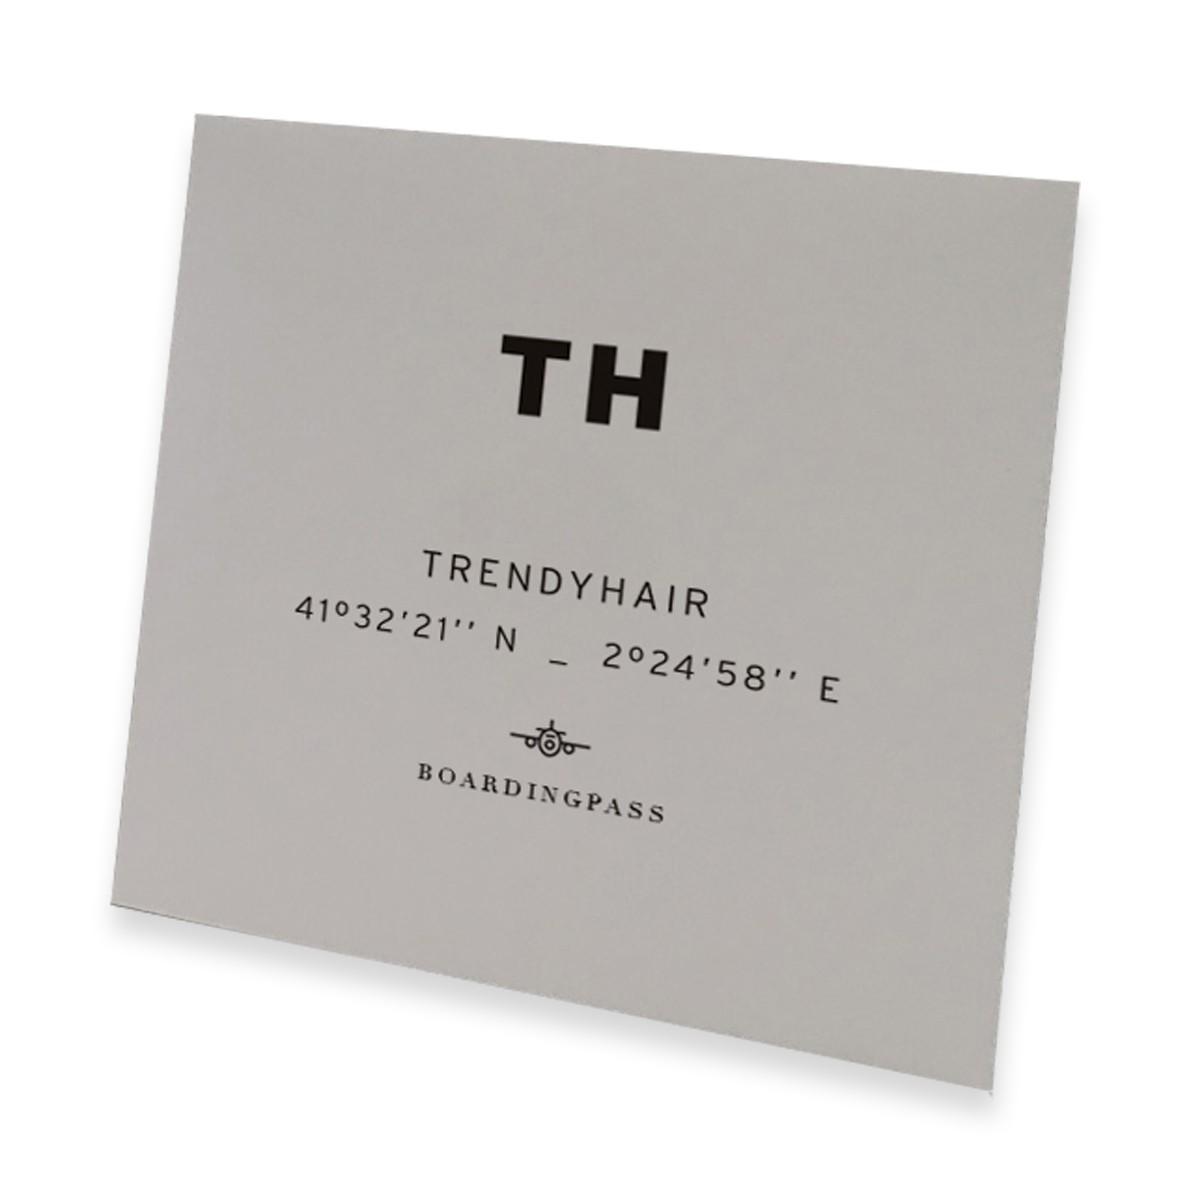 TRENDY HAIR Boarding Pass Elastic - Zestaw Szampon 7ml + Odżywka 7ml + Maska 7ml